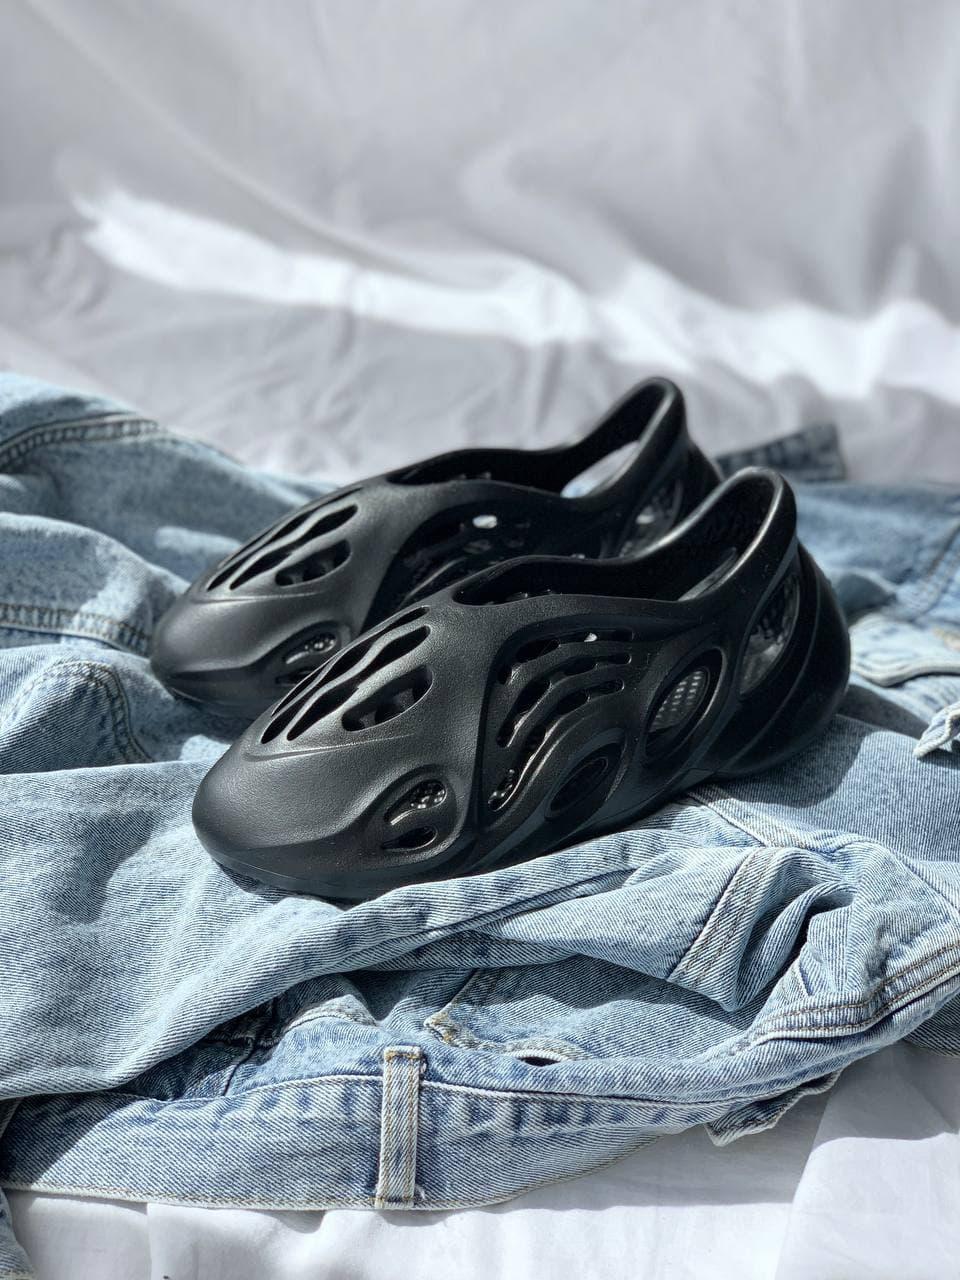 Мужские кроссовки Yeezy Foam Runner Black